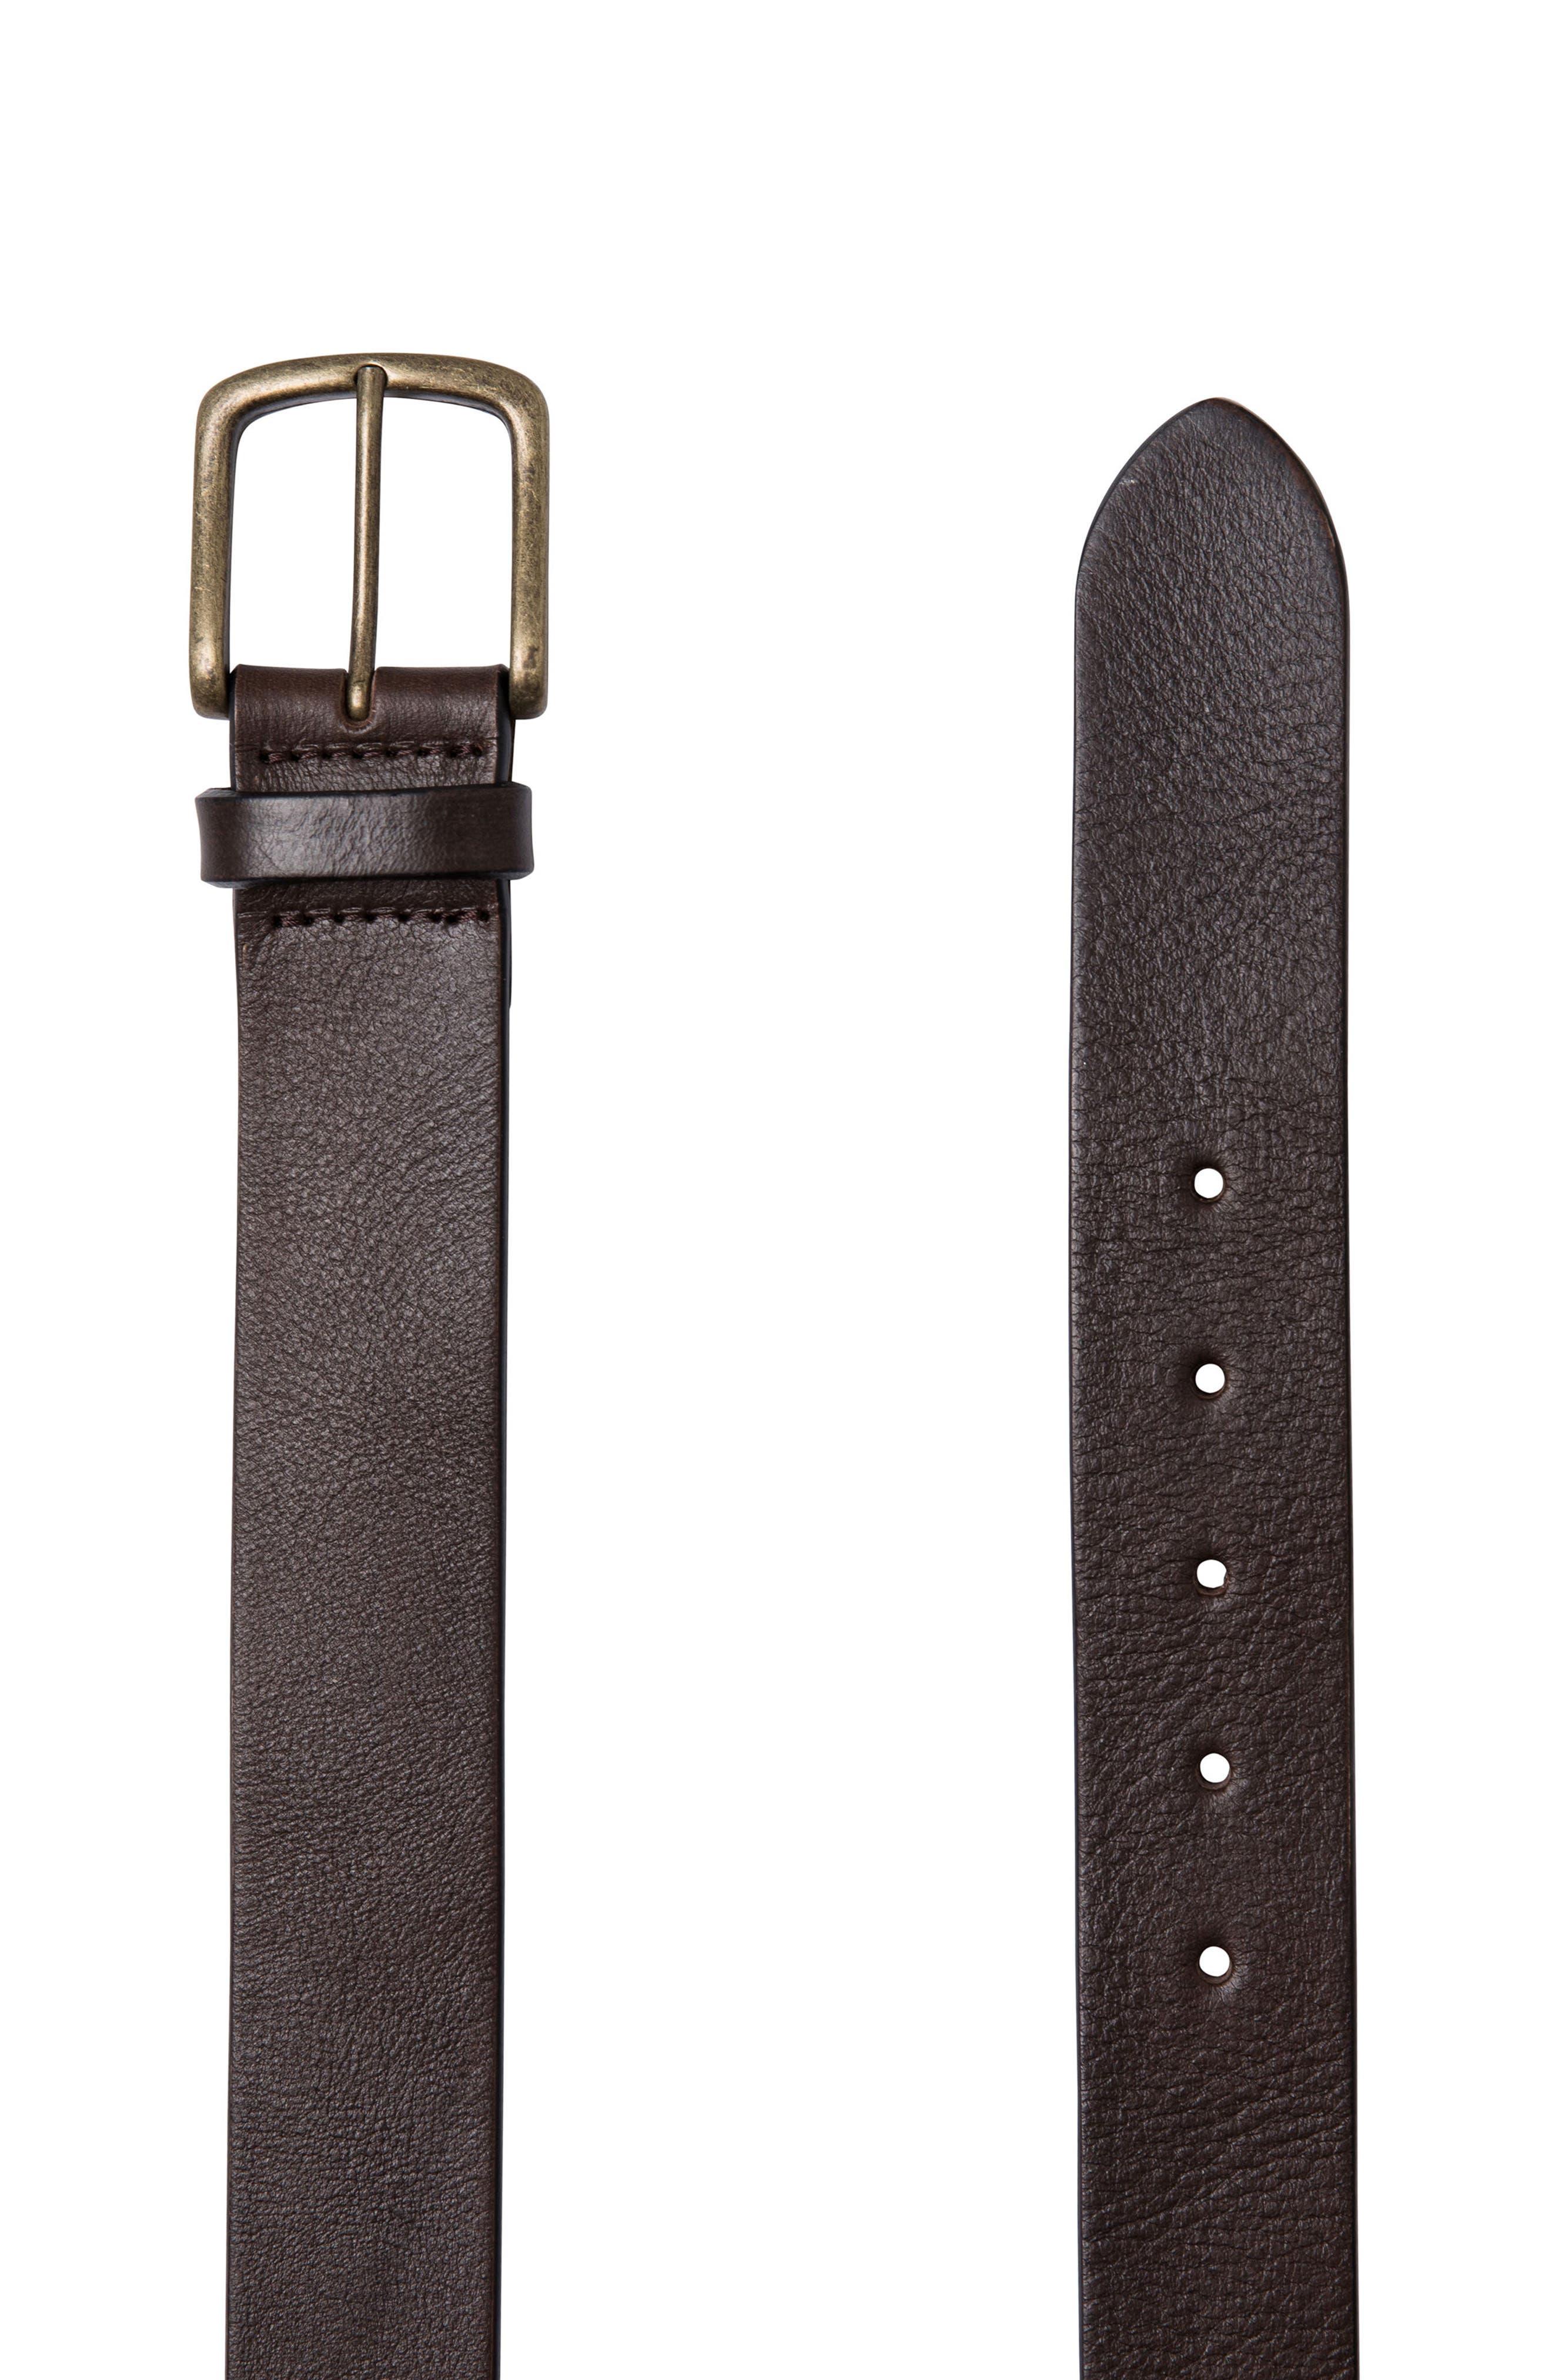 Rodd & Gunn Treble Cone Leather Belt